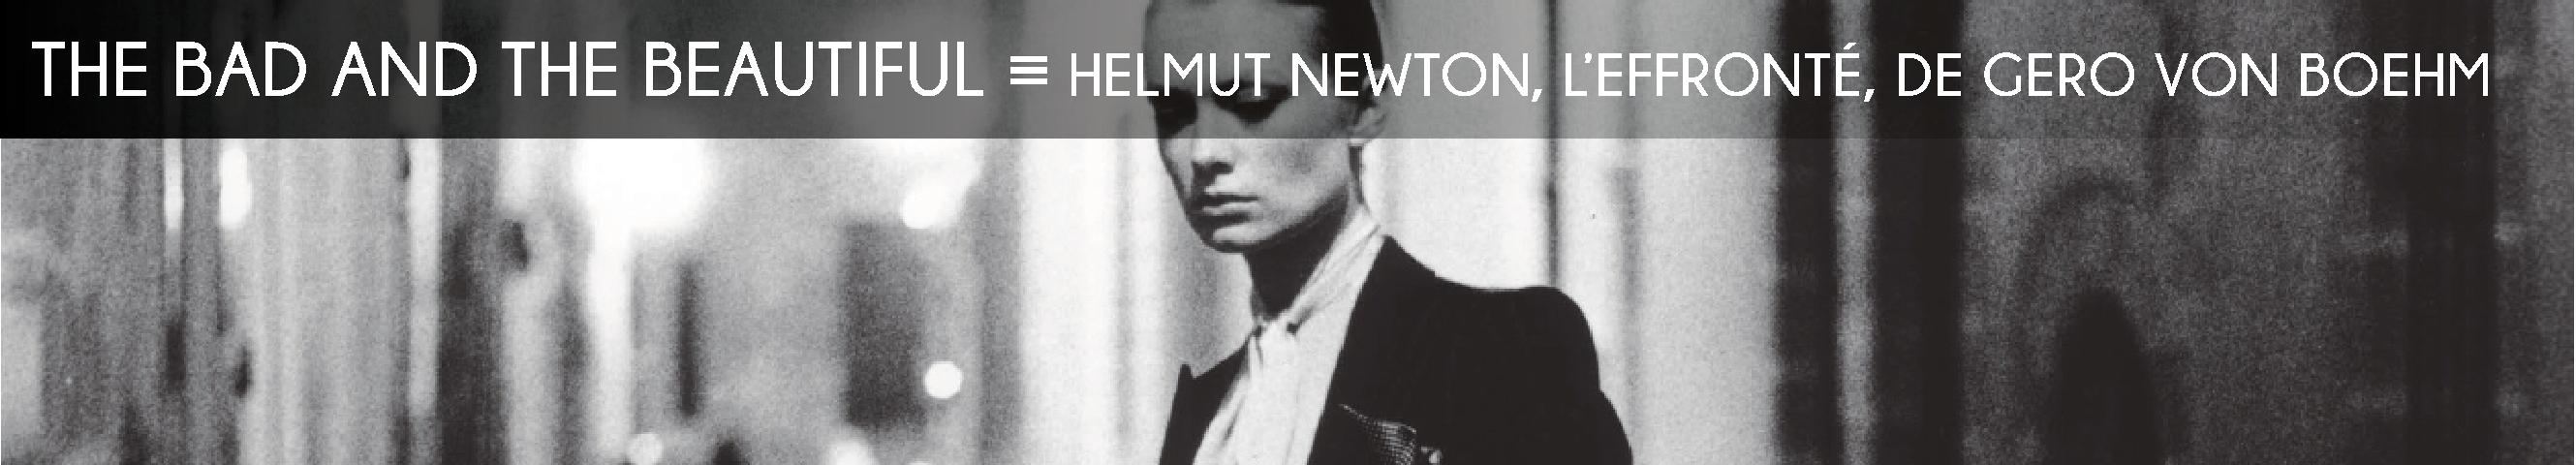 helmut newton, gero von boehm, cinema, photographie, mode, femme fatale, nu, provocation, scandale